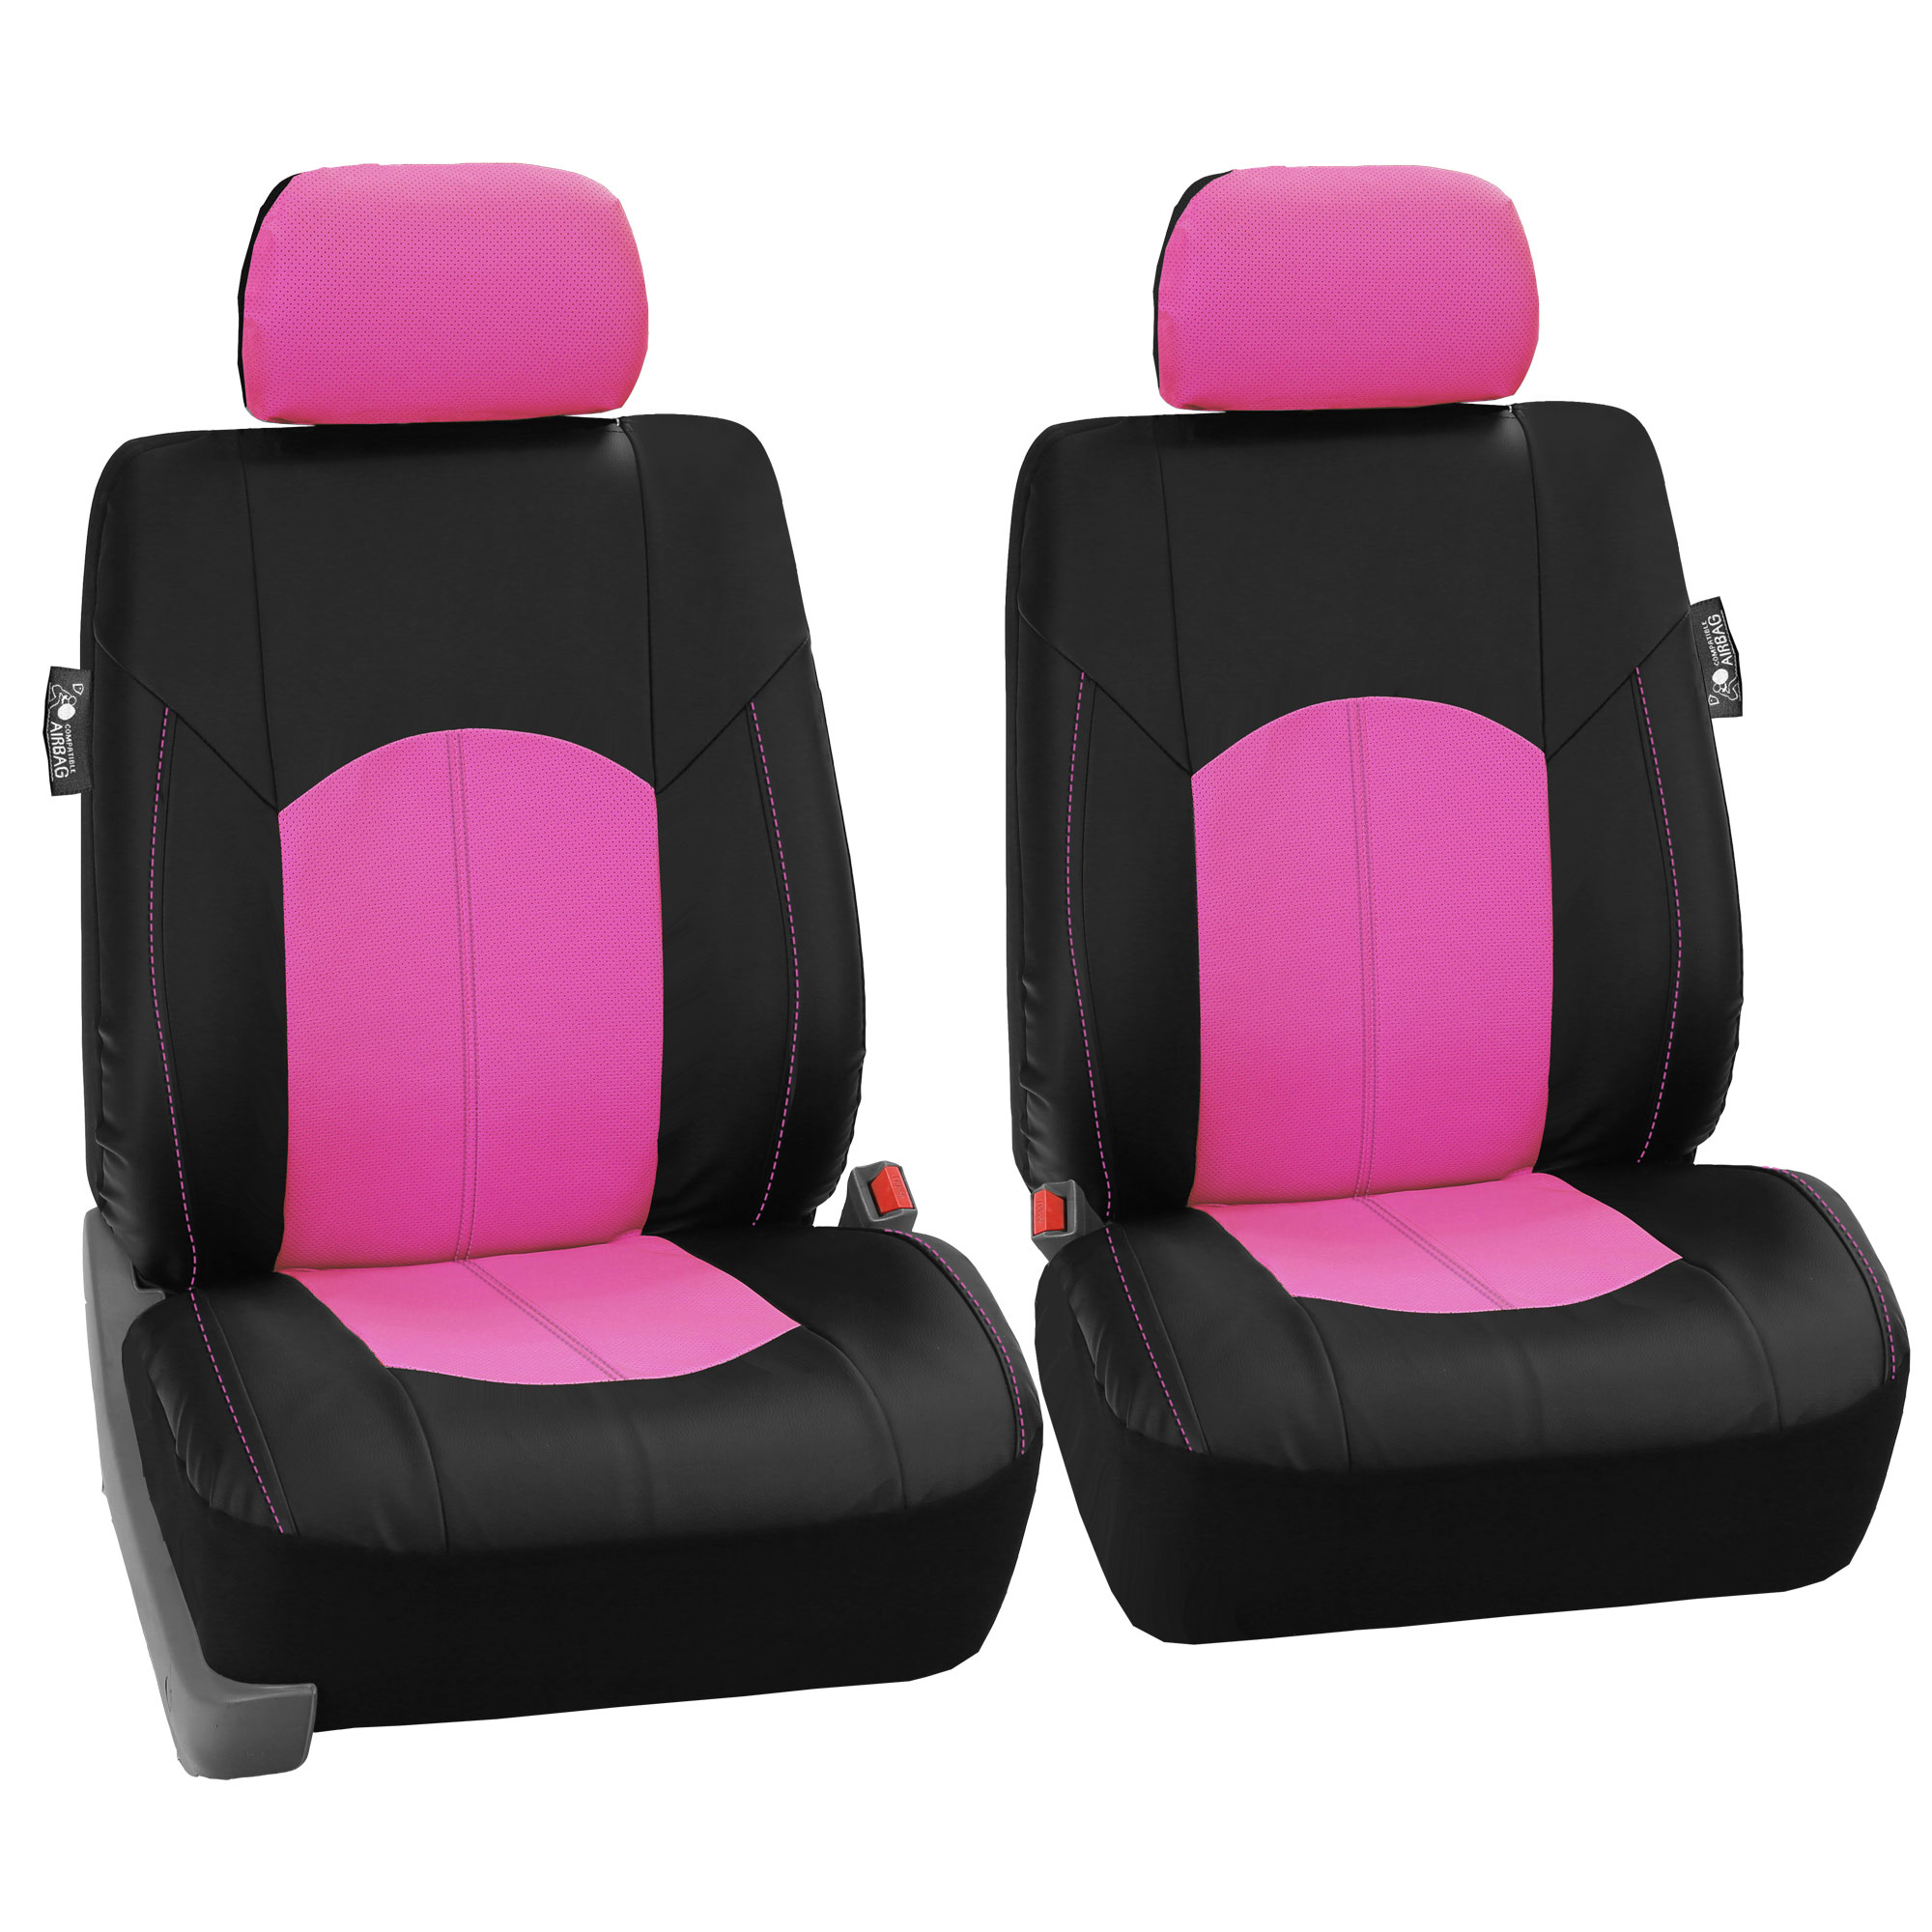 pu leather car seat covers for auto pink black 5 headrests black floor mat ebay. Black Bedroom Furniture Sets. Home Design Ideas